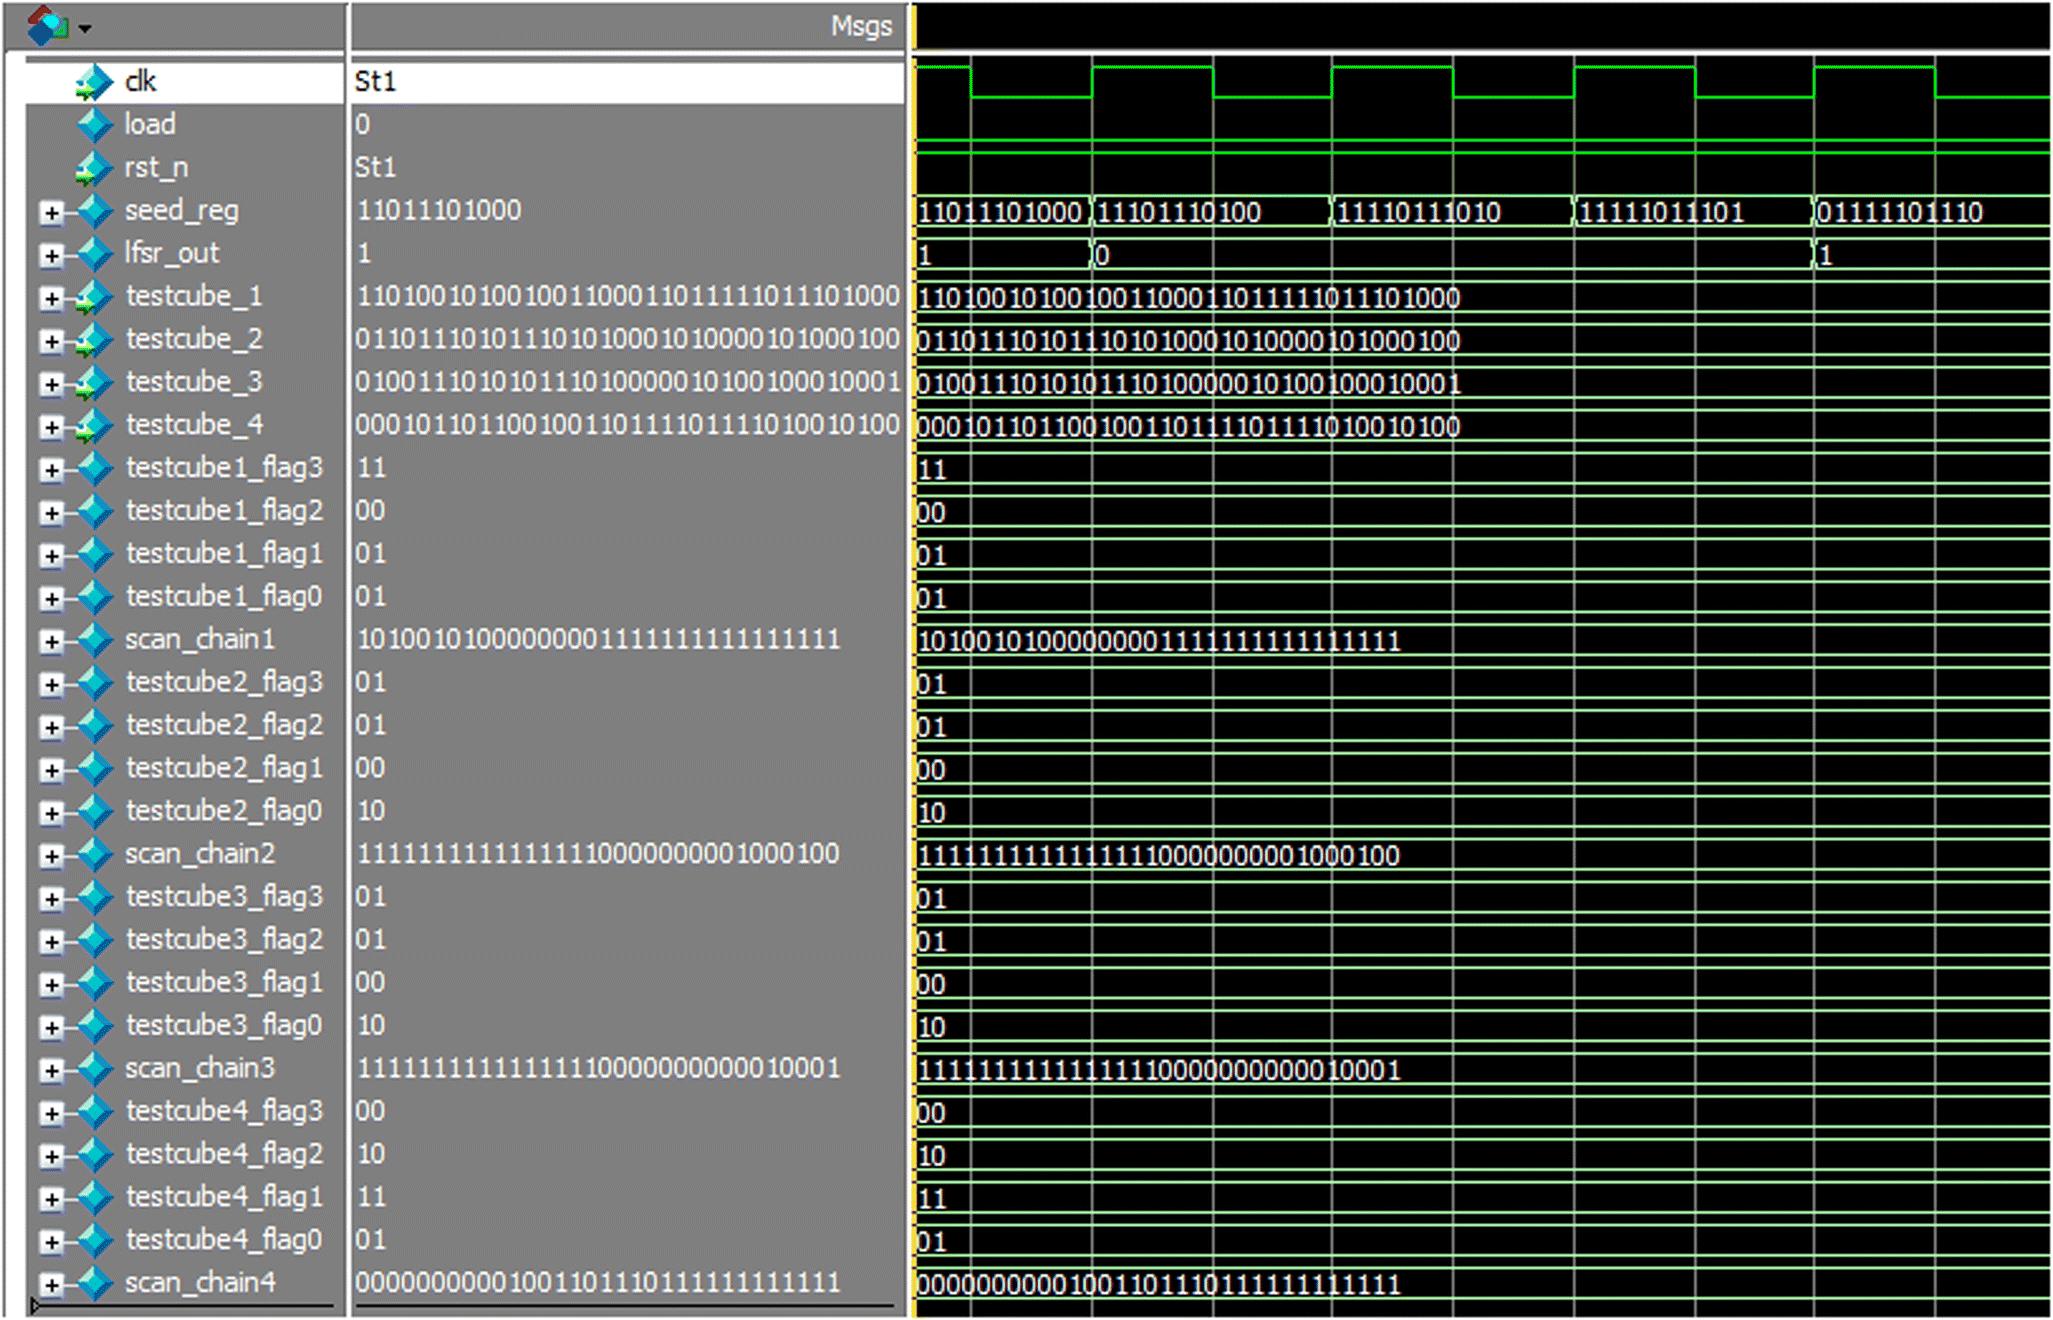 LFSR Reseeding-Oriented Low-Power Test-Compression